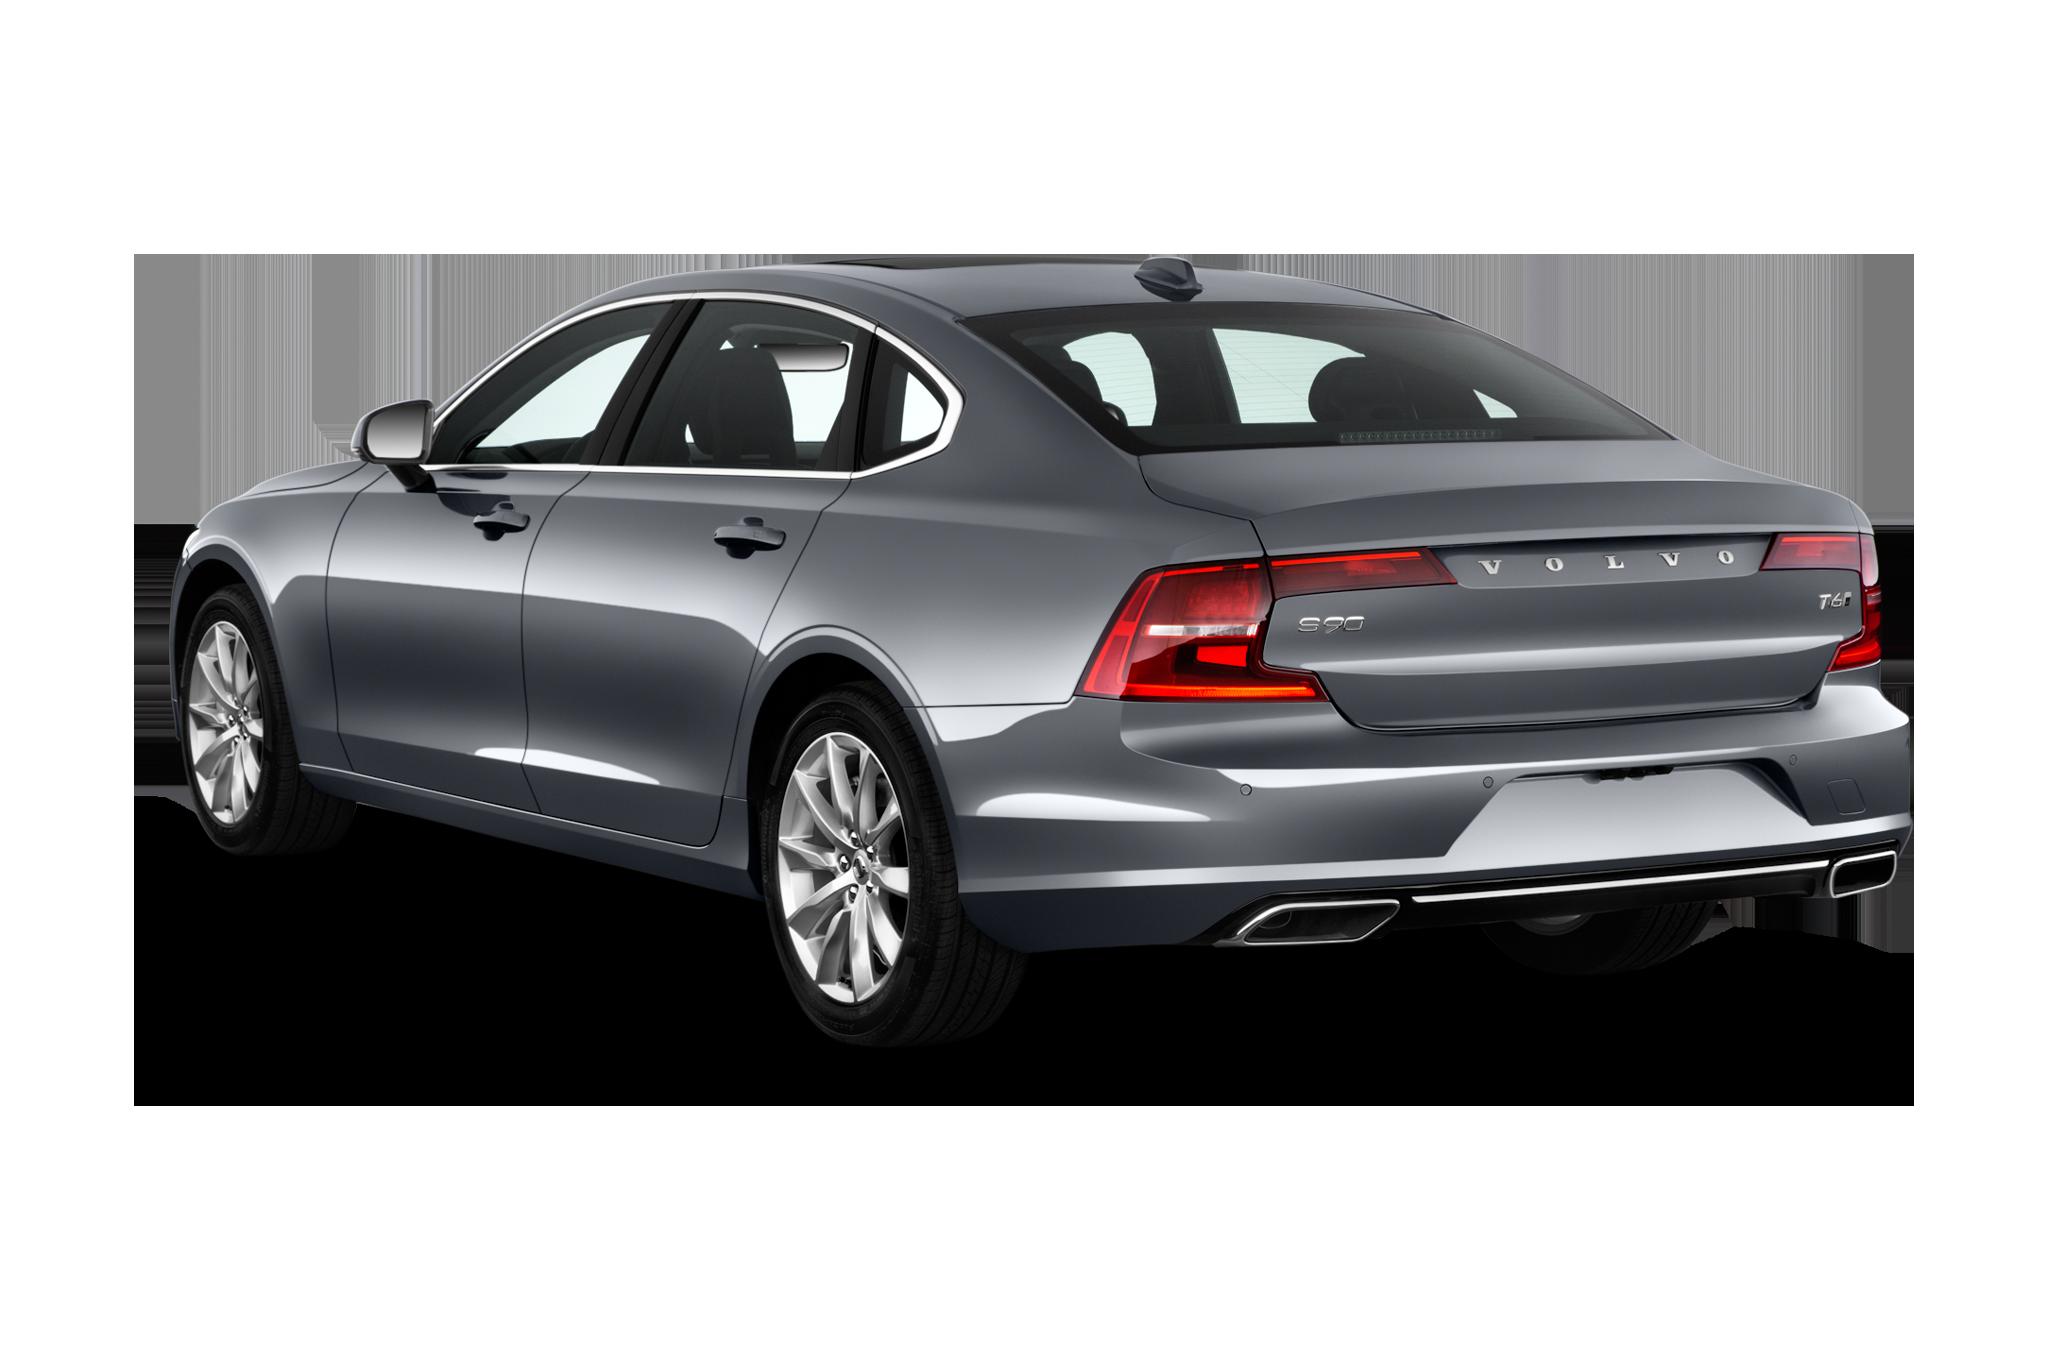 Report: Volvo S90 Luxury Sedan Design Leaked In Model-Car Form